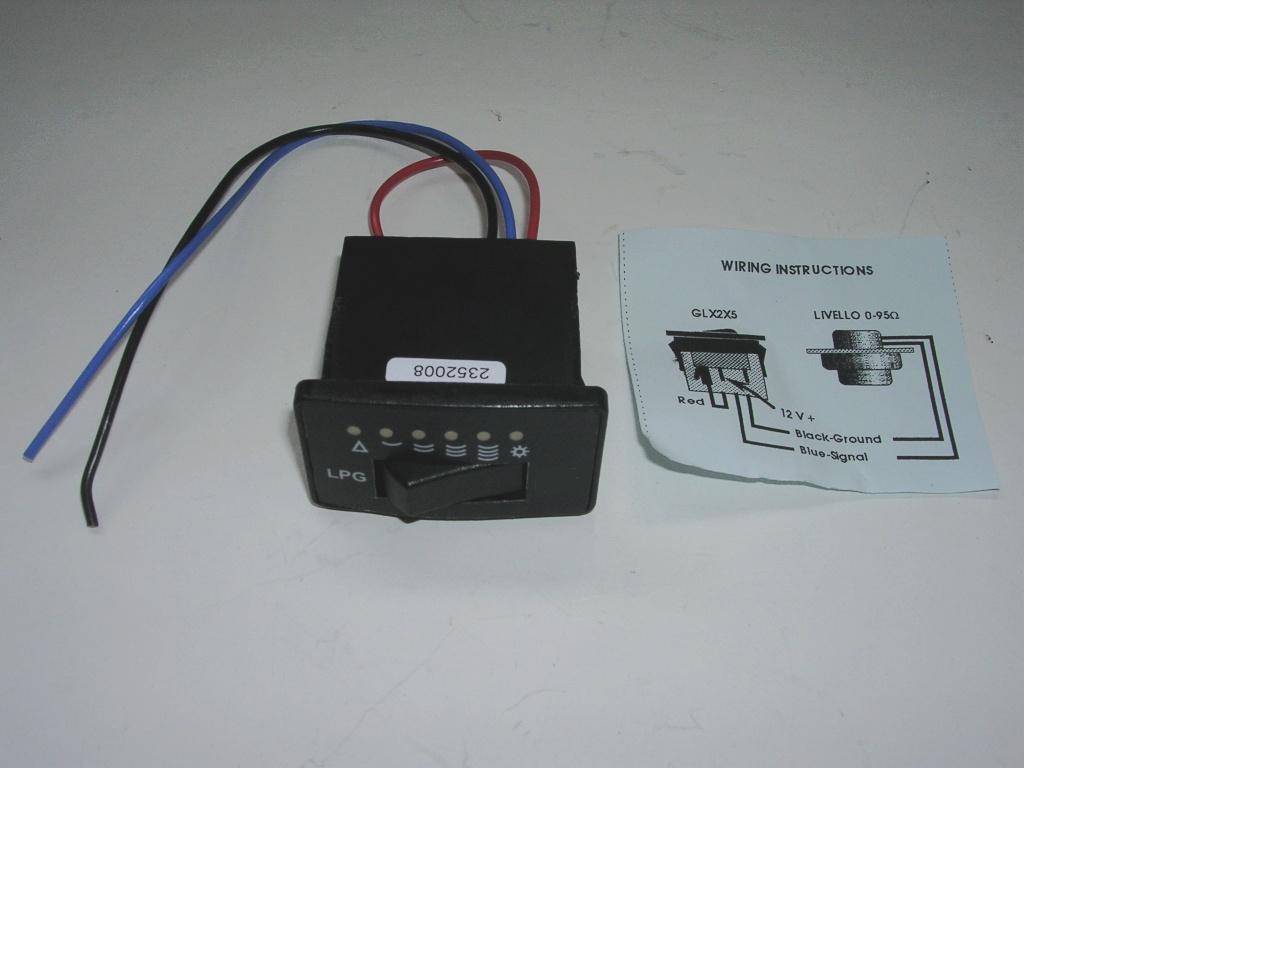 3-Wegeschalter mit LED-Anzeige - Autogas Webshop